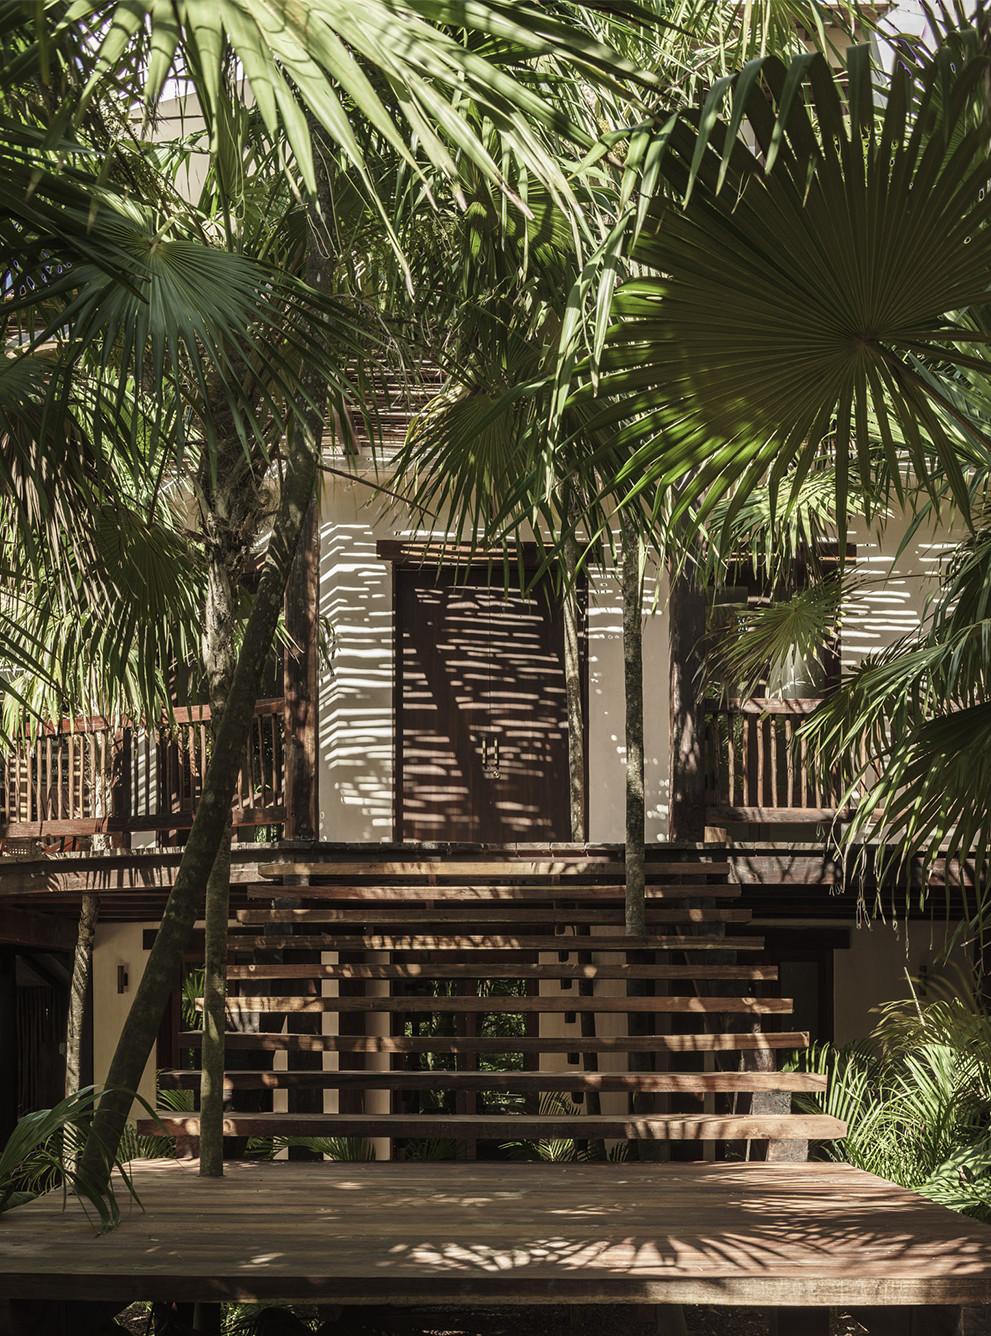 tulum-treehouse-house-009-04.jpg